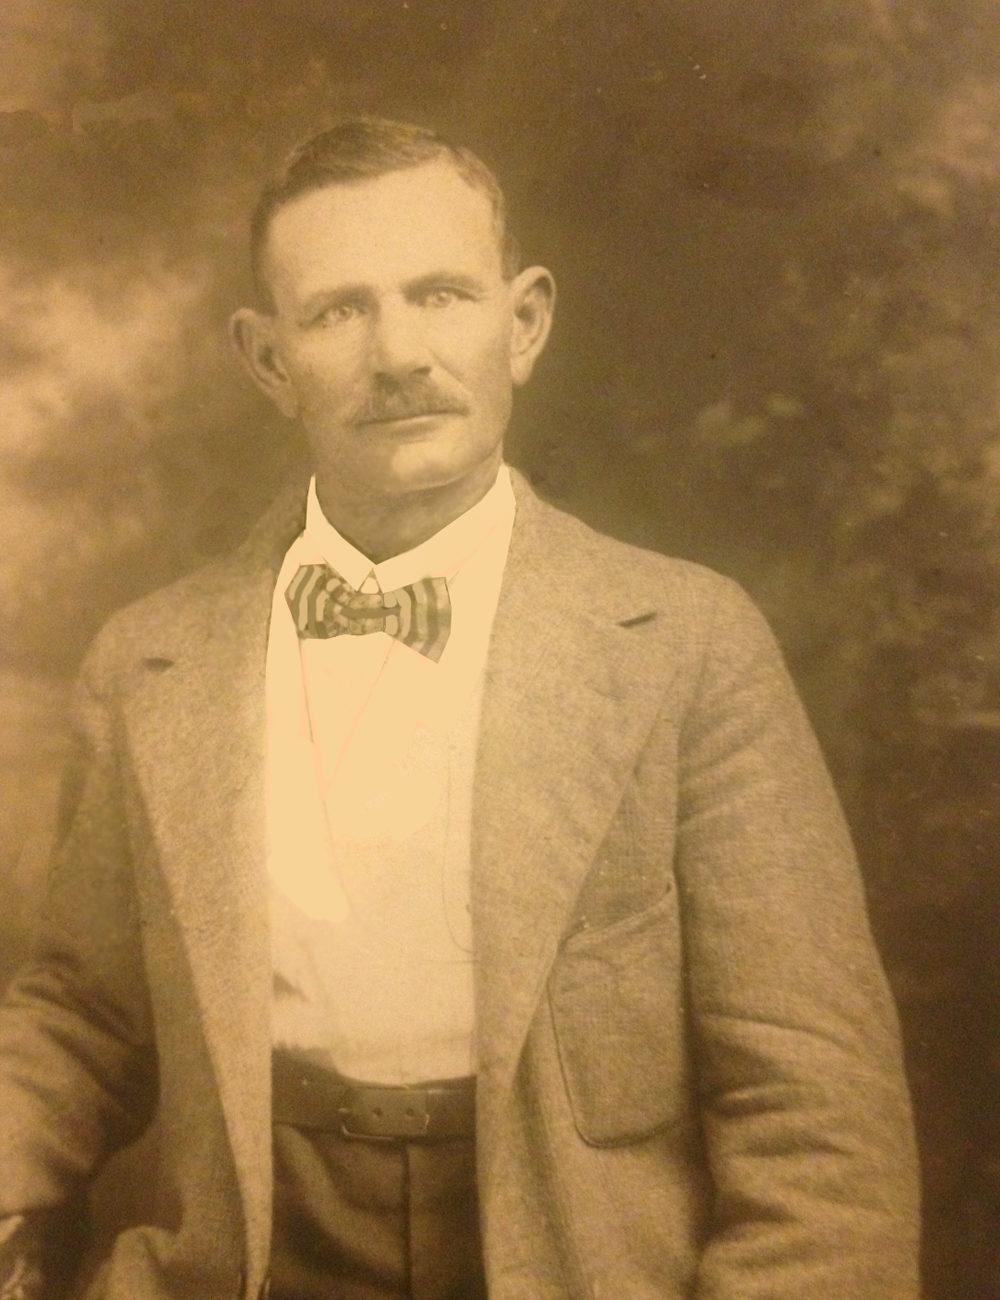 William Elijah Perryman